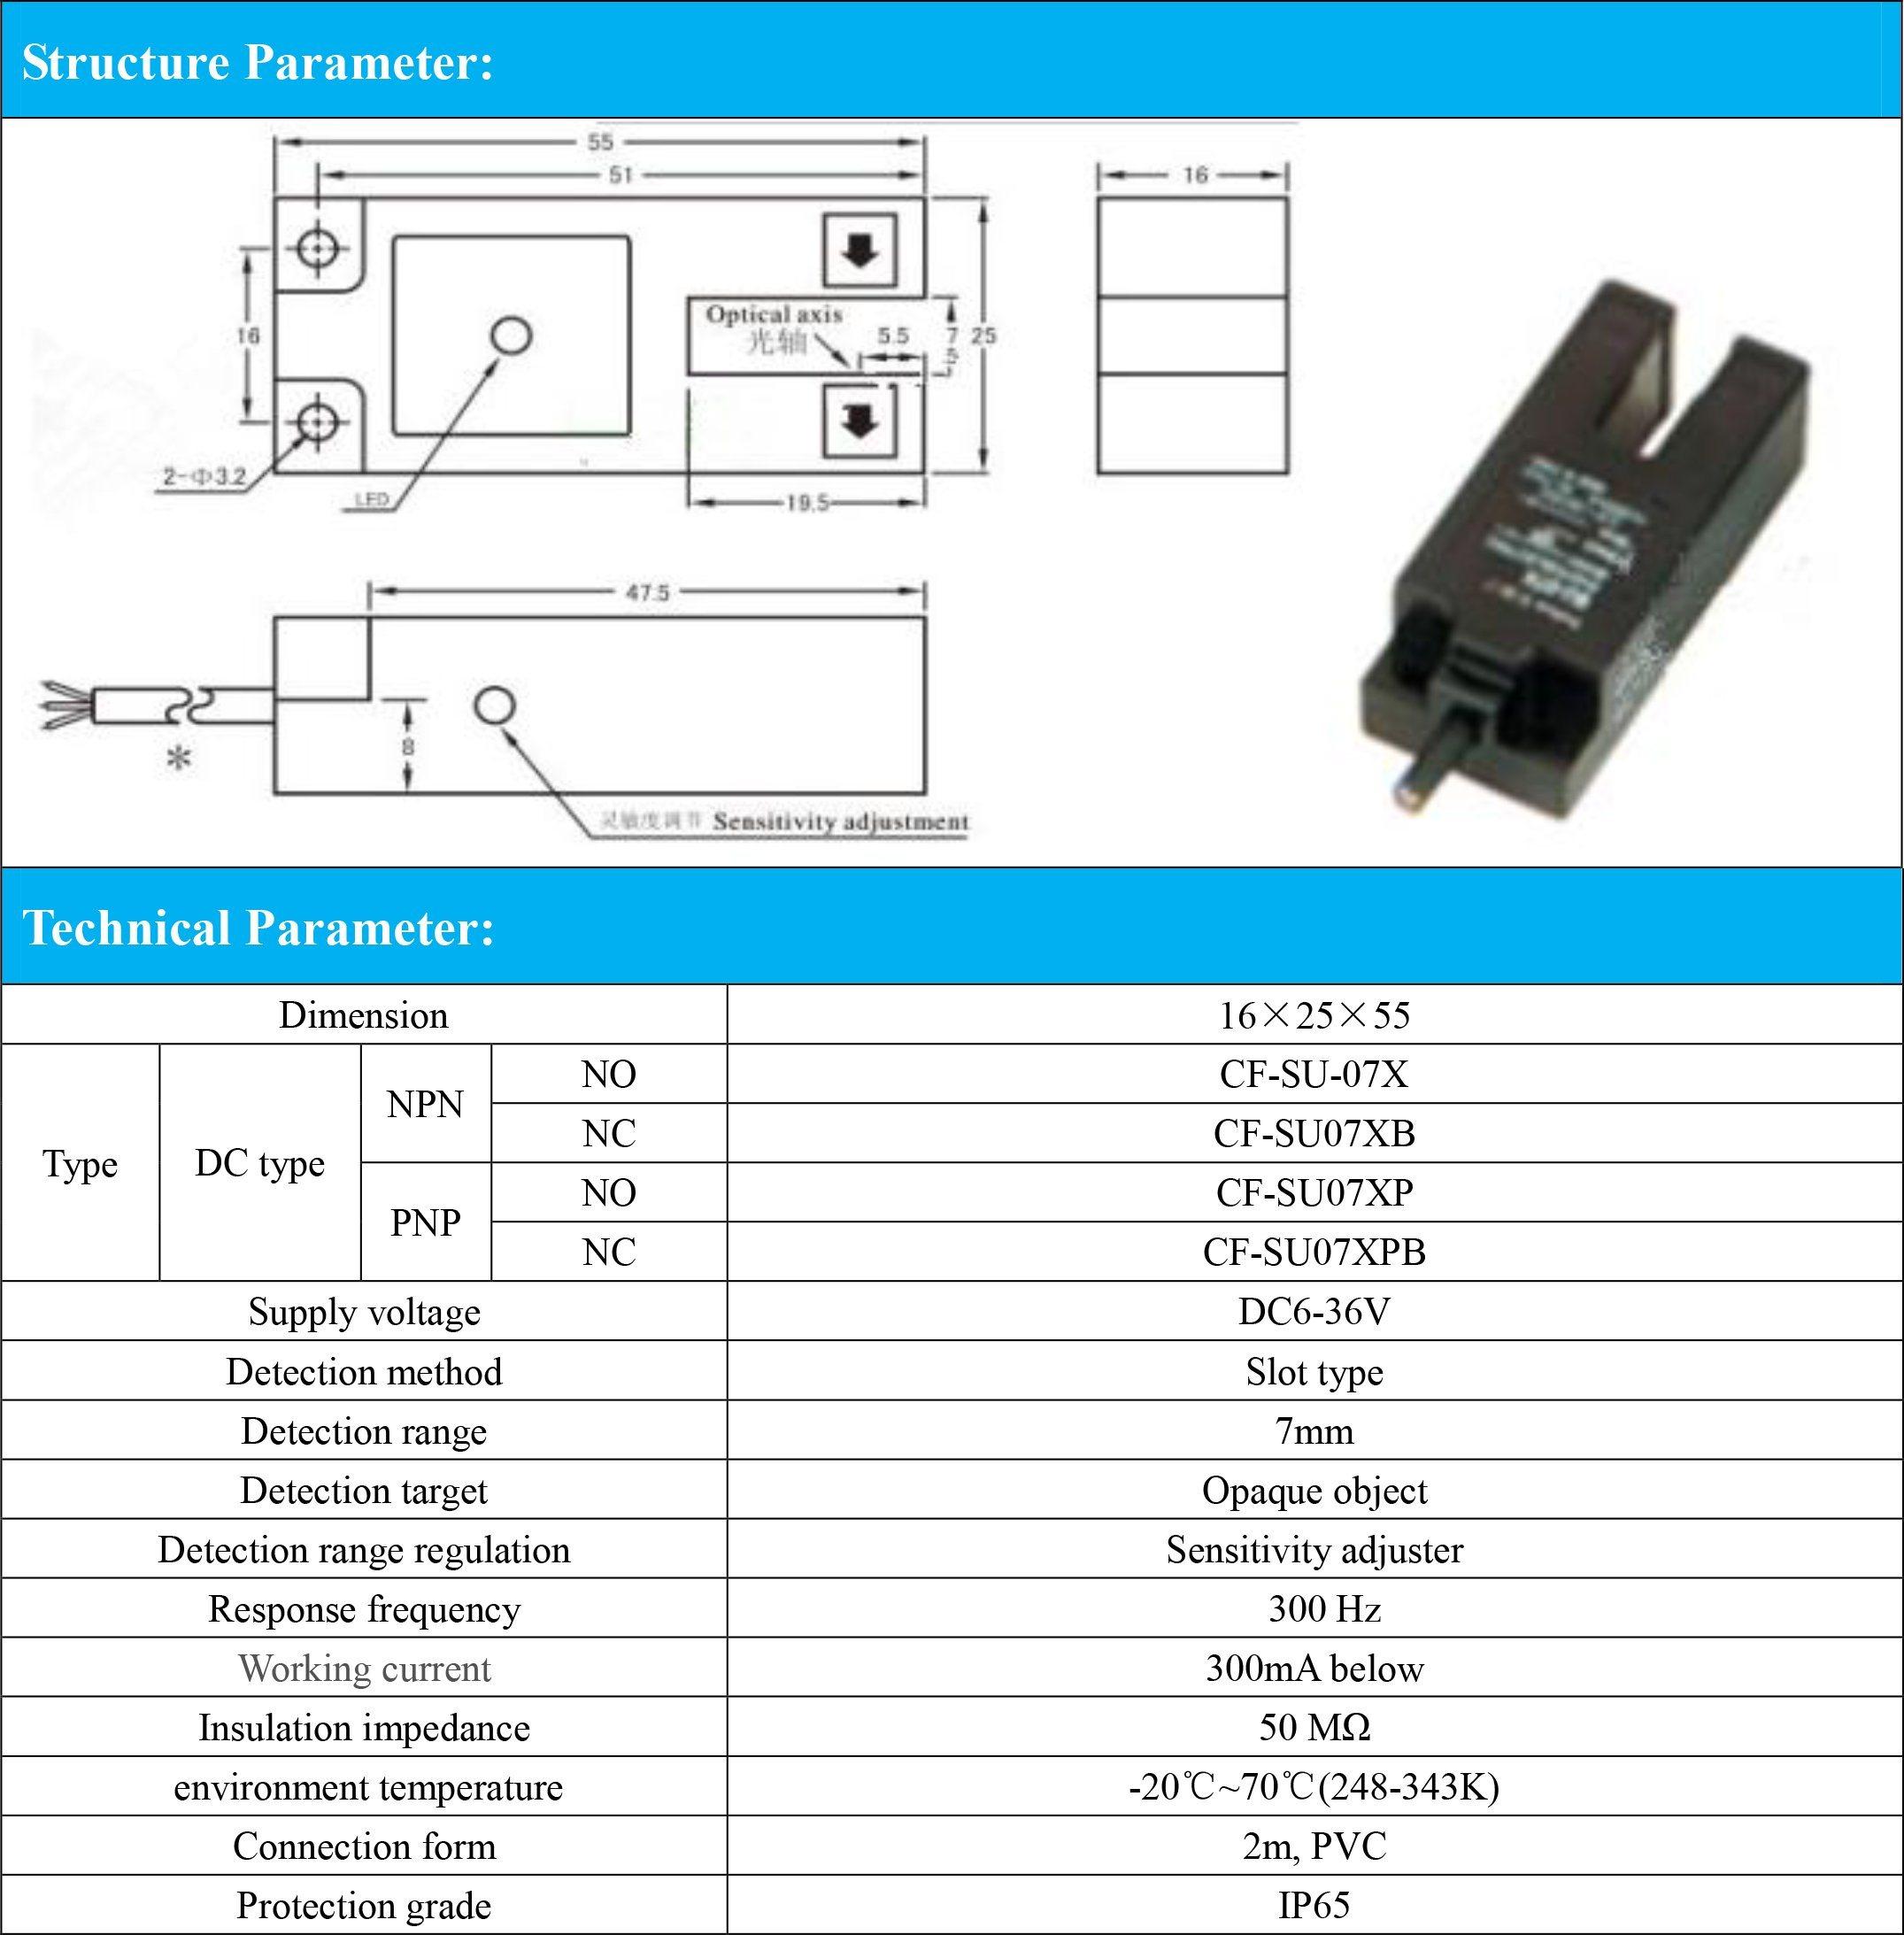 China Pnp Nc Slot Type 7mm Detection Range Photoelectric Switch Dc Wiring Diagrams Sensor